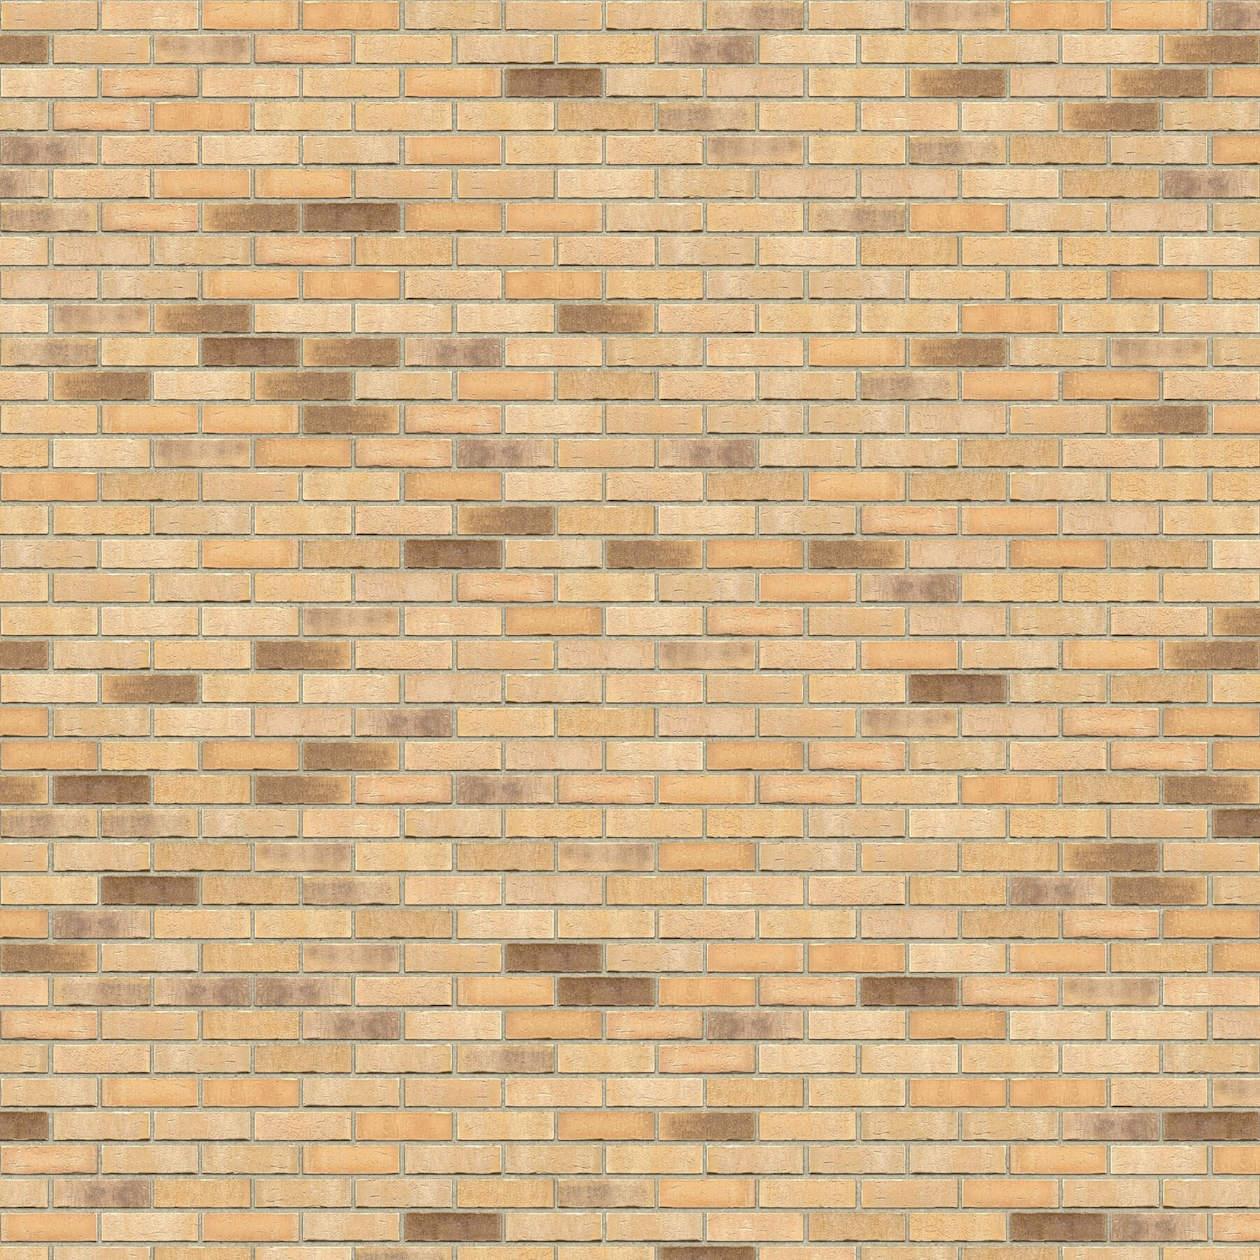 Puna-cigla-FeldHaus-Klinker-brick-house-Beograd-nf-k-723-Bez Fuga